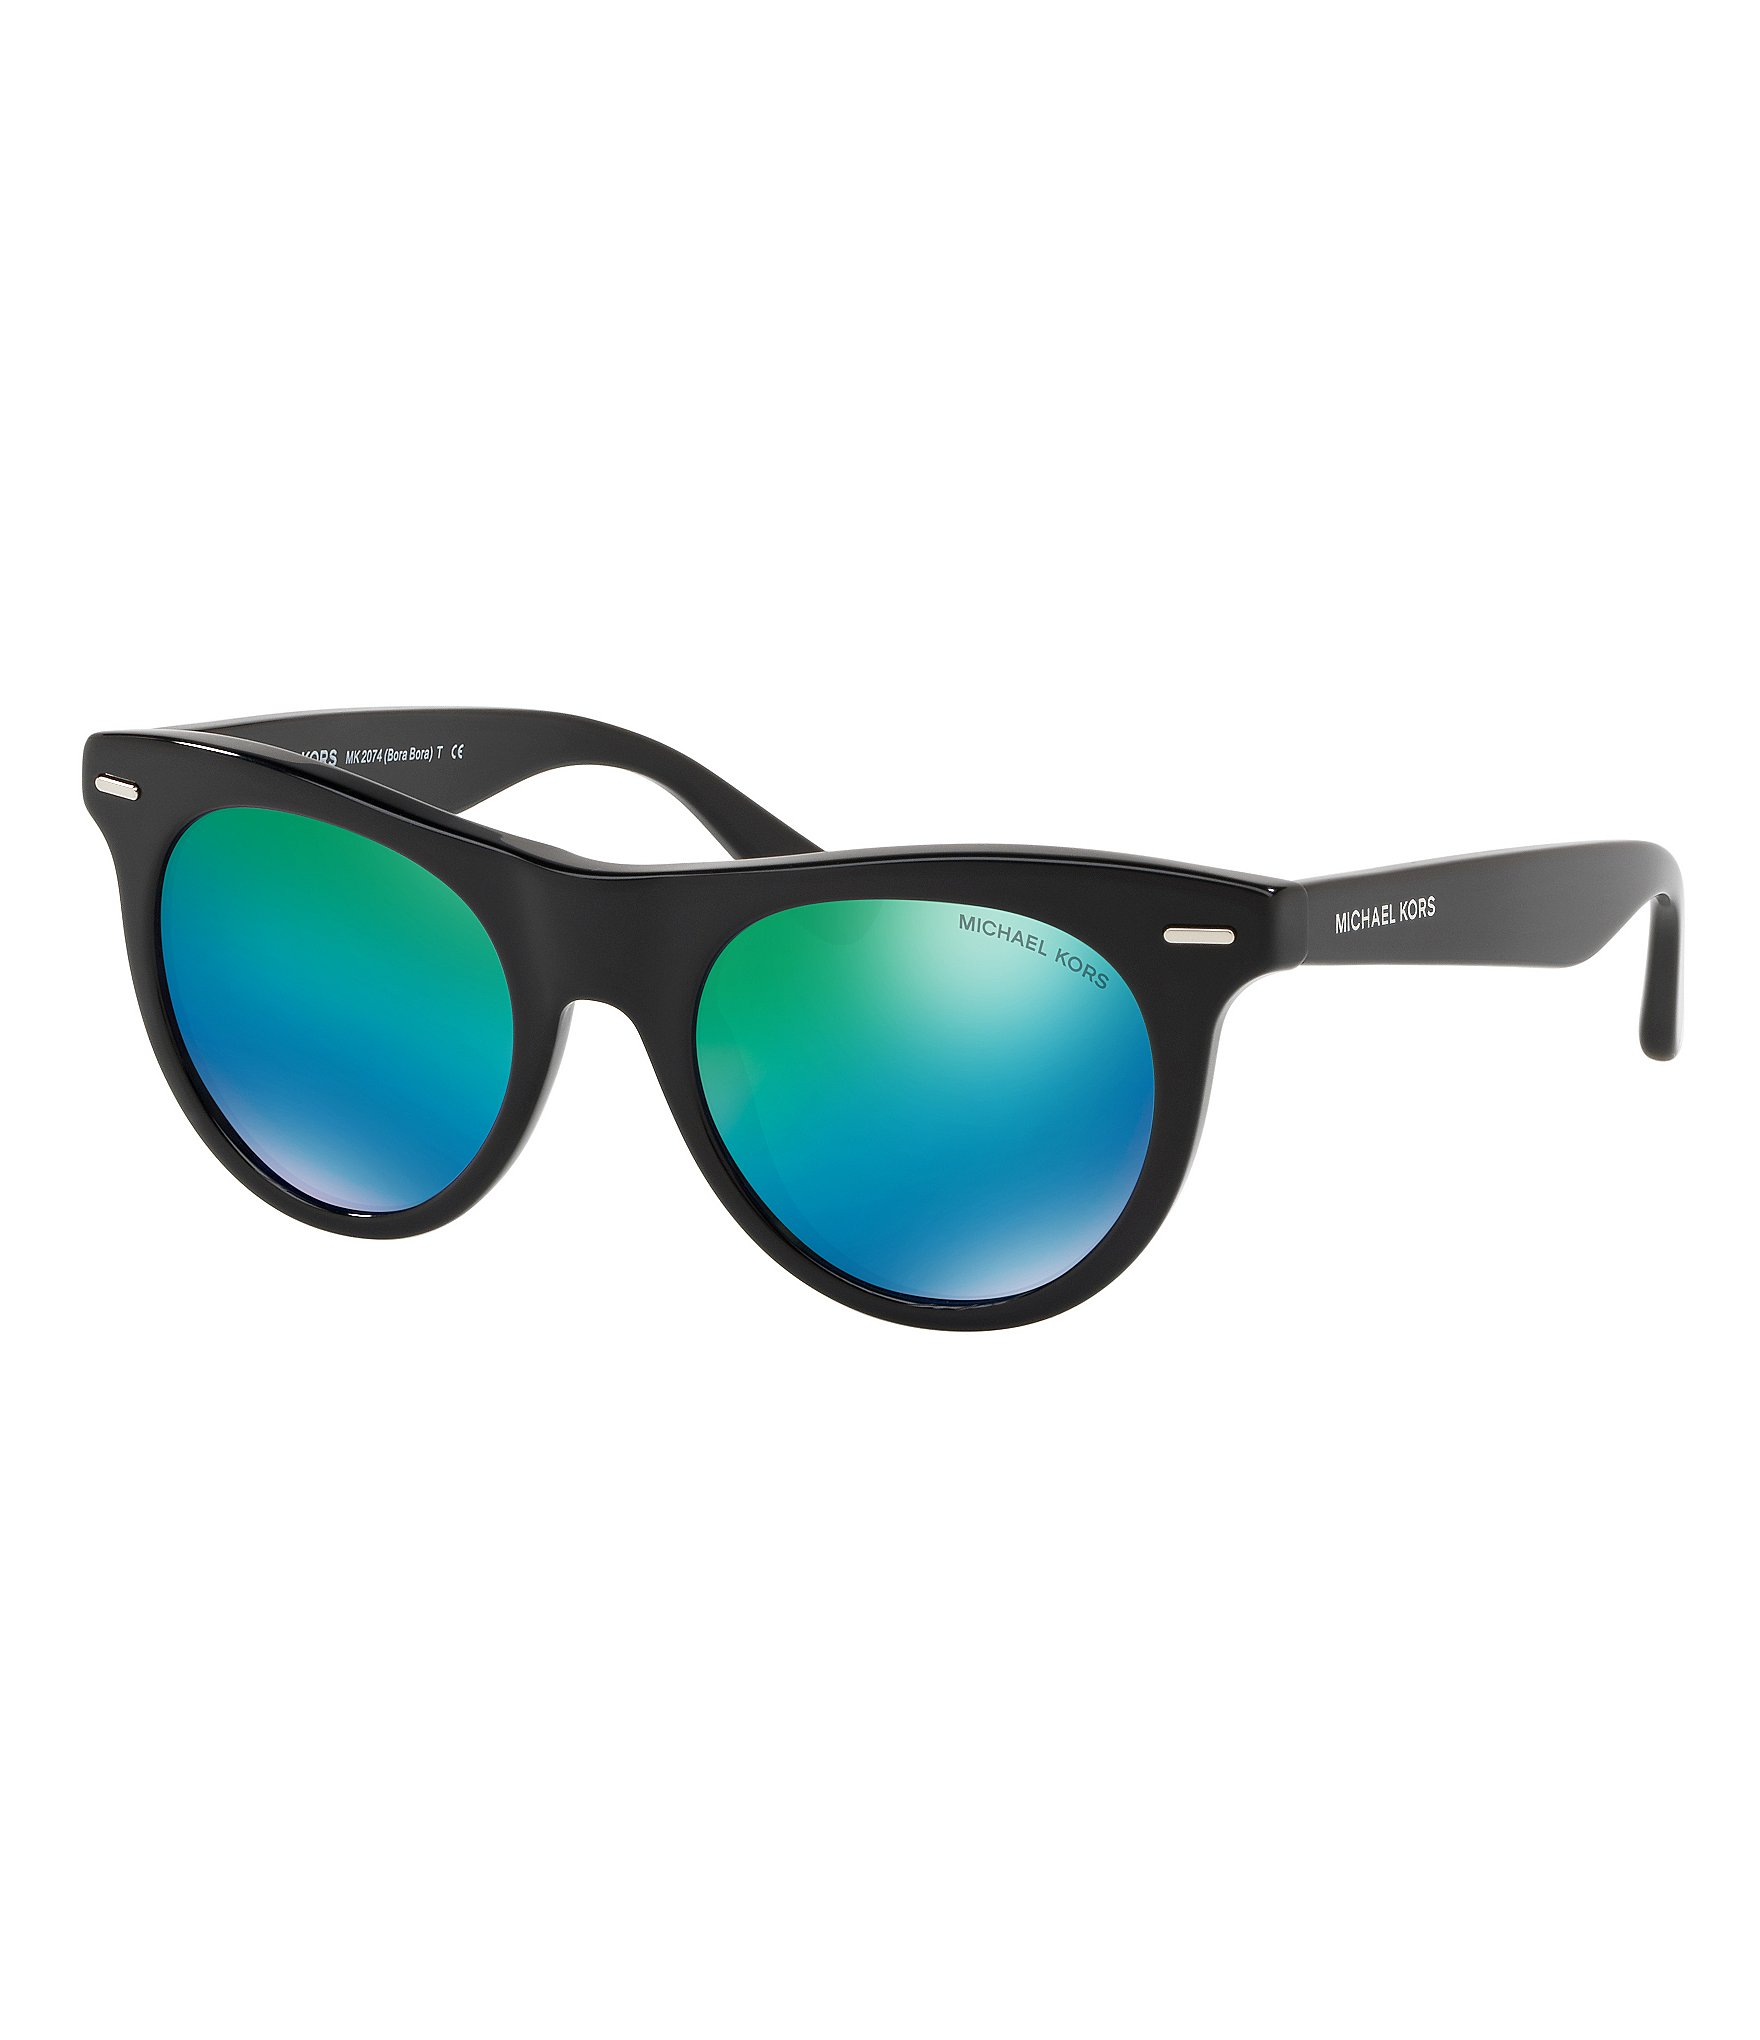 5565cf31261 Sunglasses   Eyewear